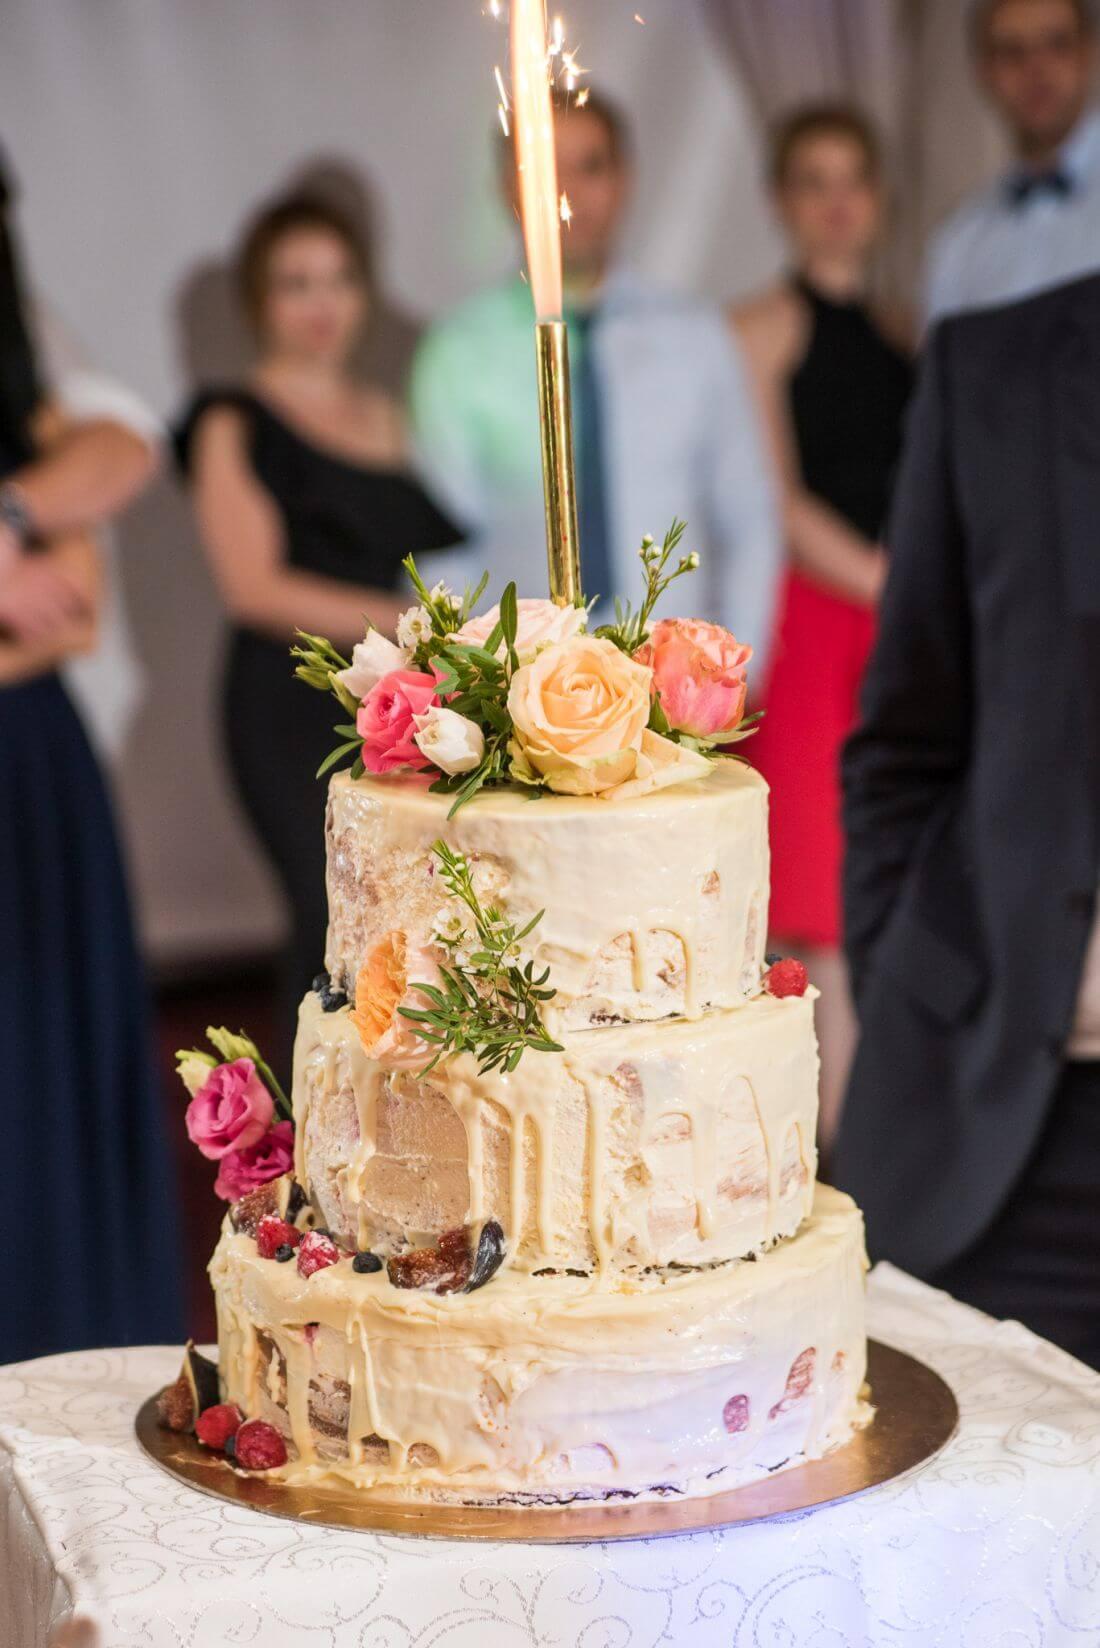 Nunta cu prieteni dragi – Oana si Dani-IDO-Weddings-nuntiinaerliber (1)